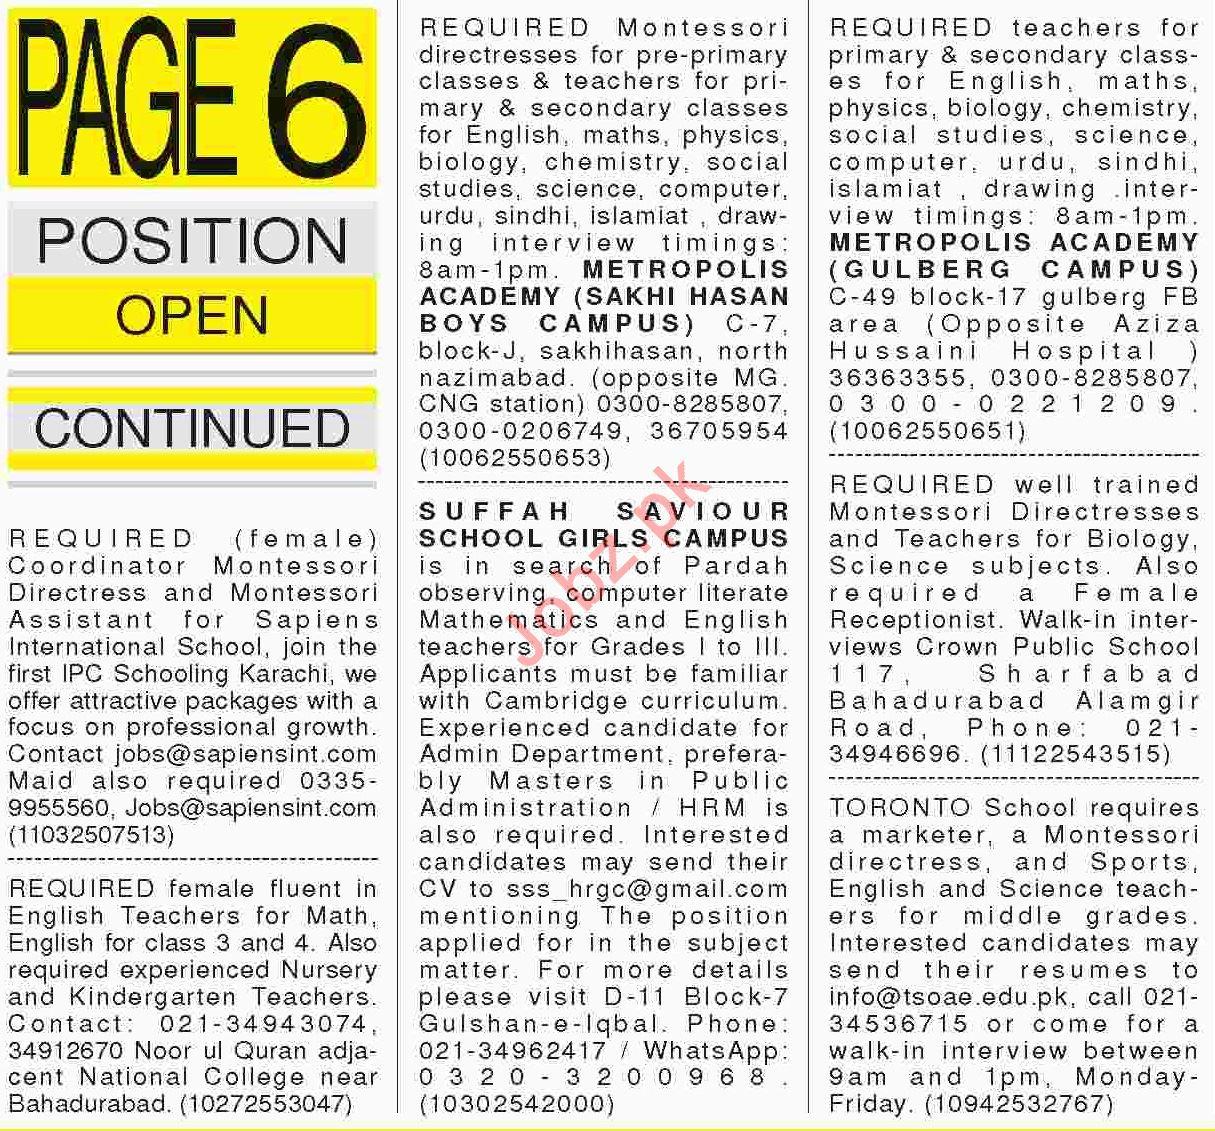 Daily Dawn Sunday Newspaper Teachers Jobs in Karachi